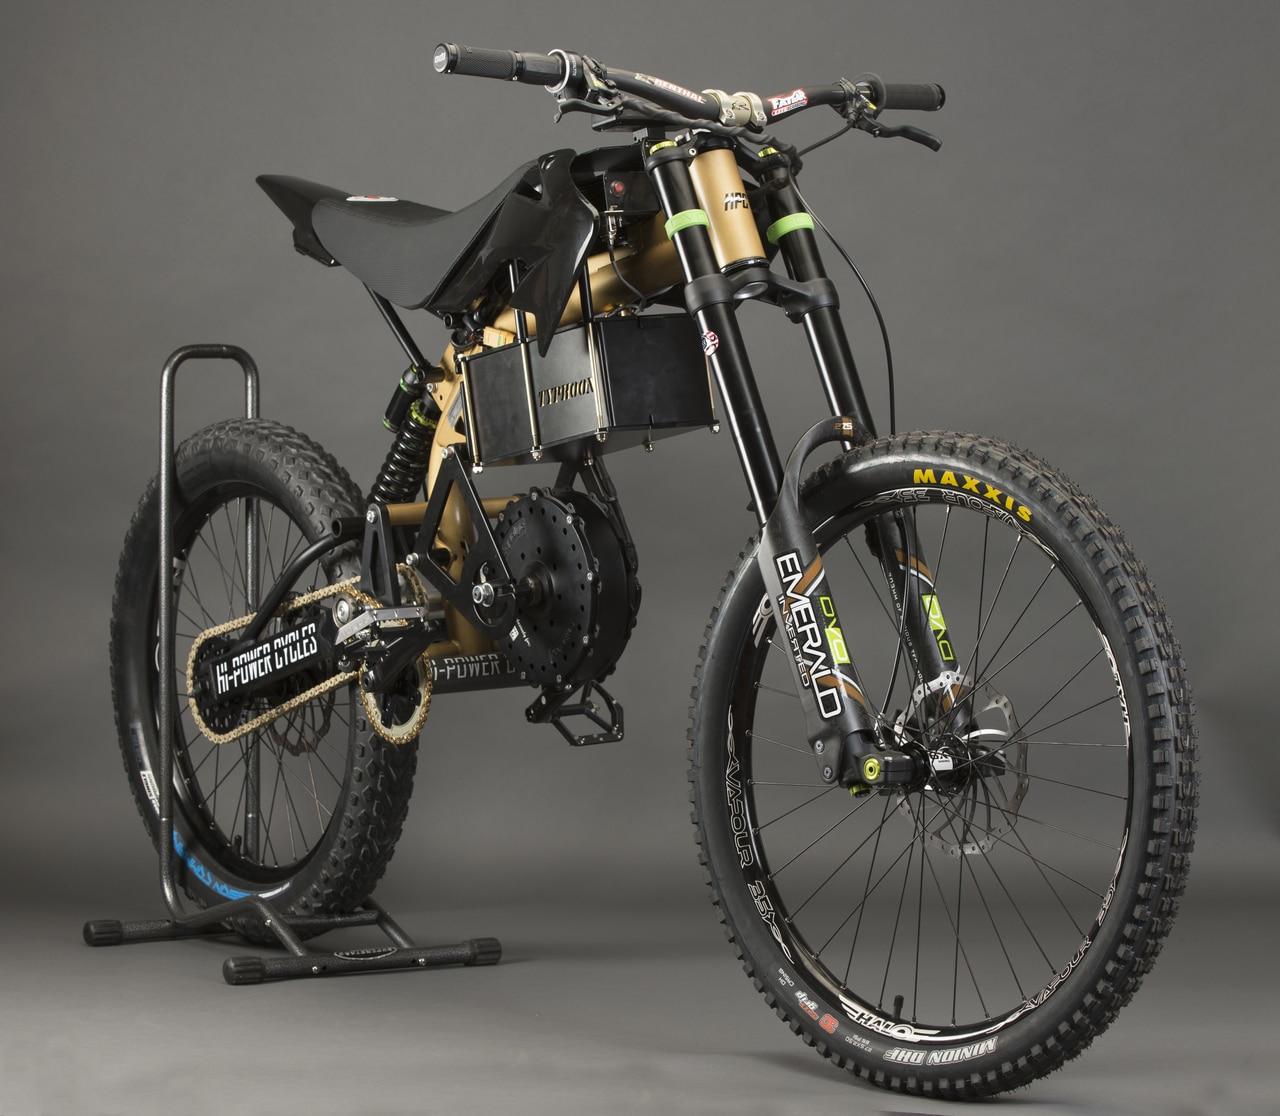 Typhoon and Typhoon Pro Electric Bikes-Hi Power Cycles